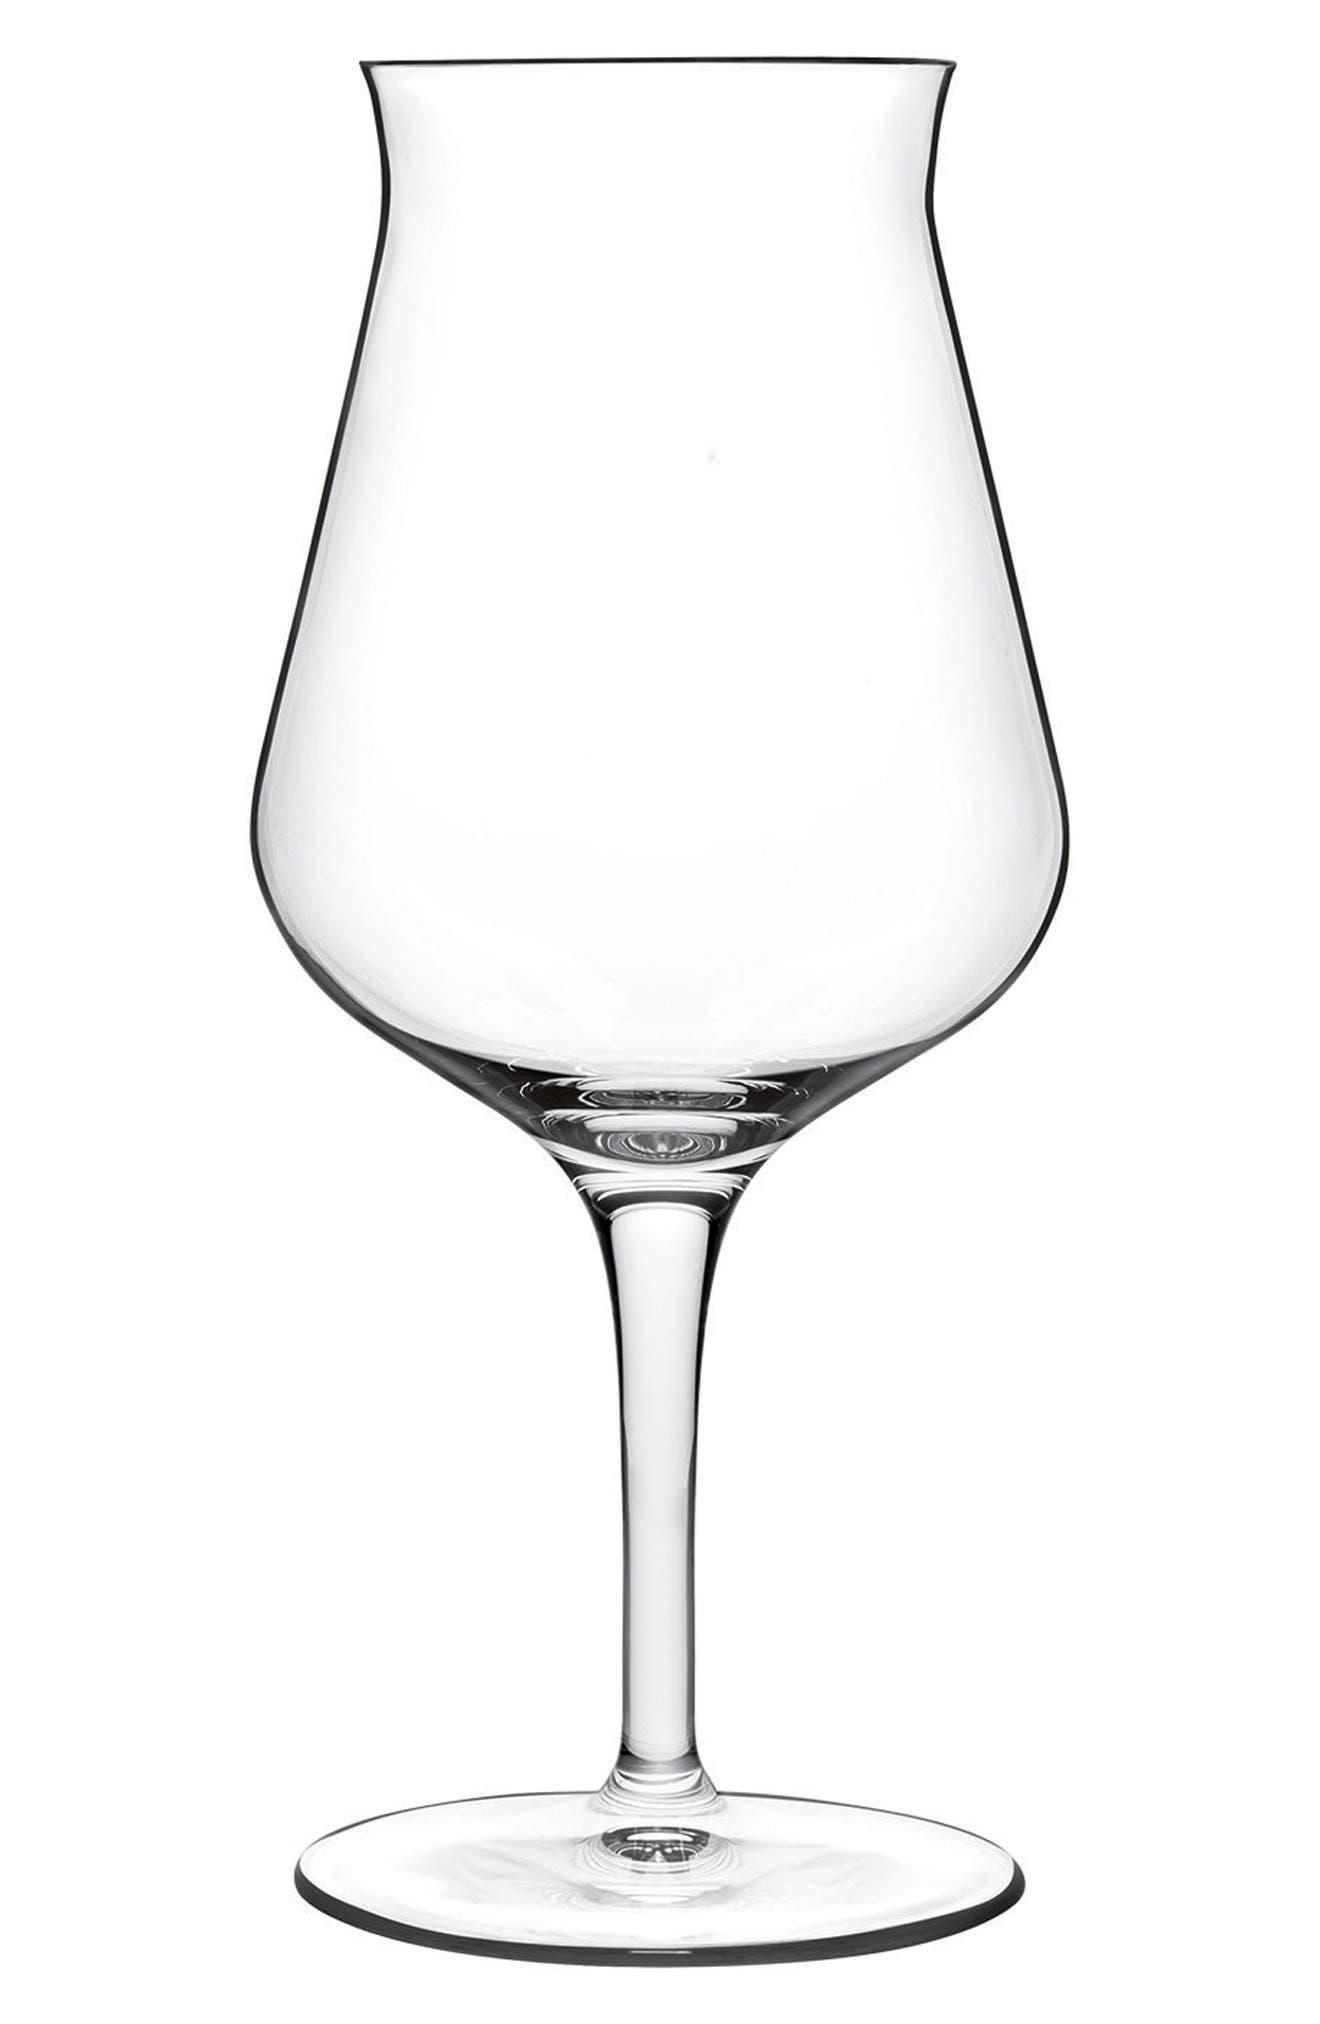 Main Image - Luigi Bormioli Birrateque Beer Tester Glass